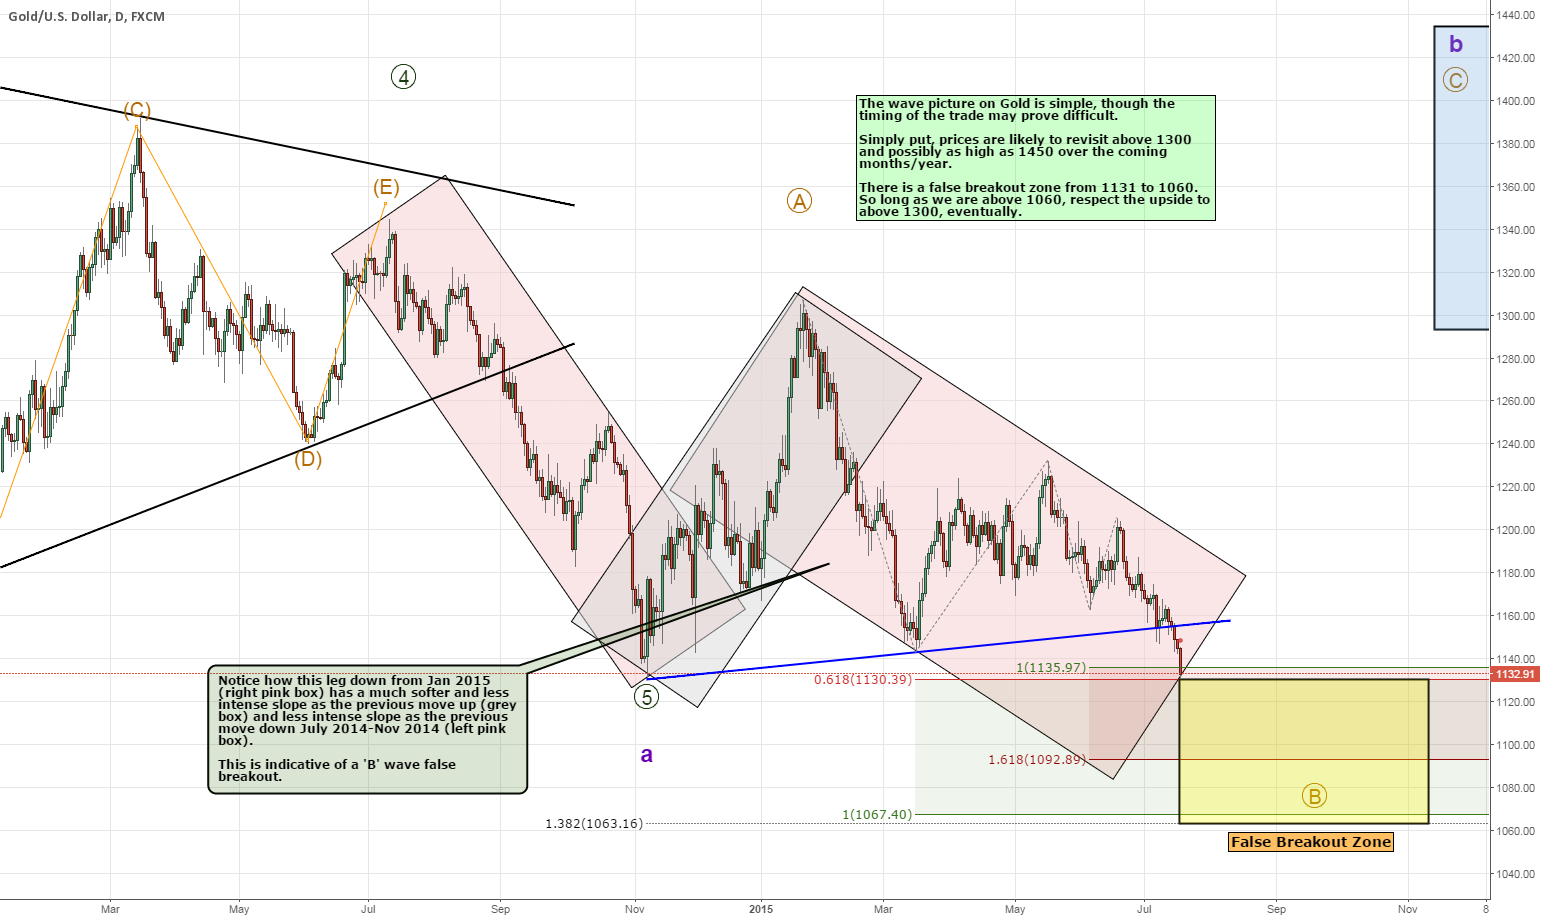 Gold and the False Break - 1065 Key Level